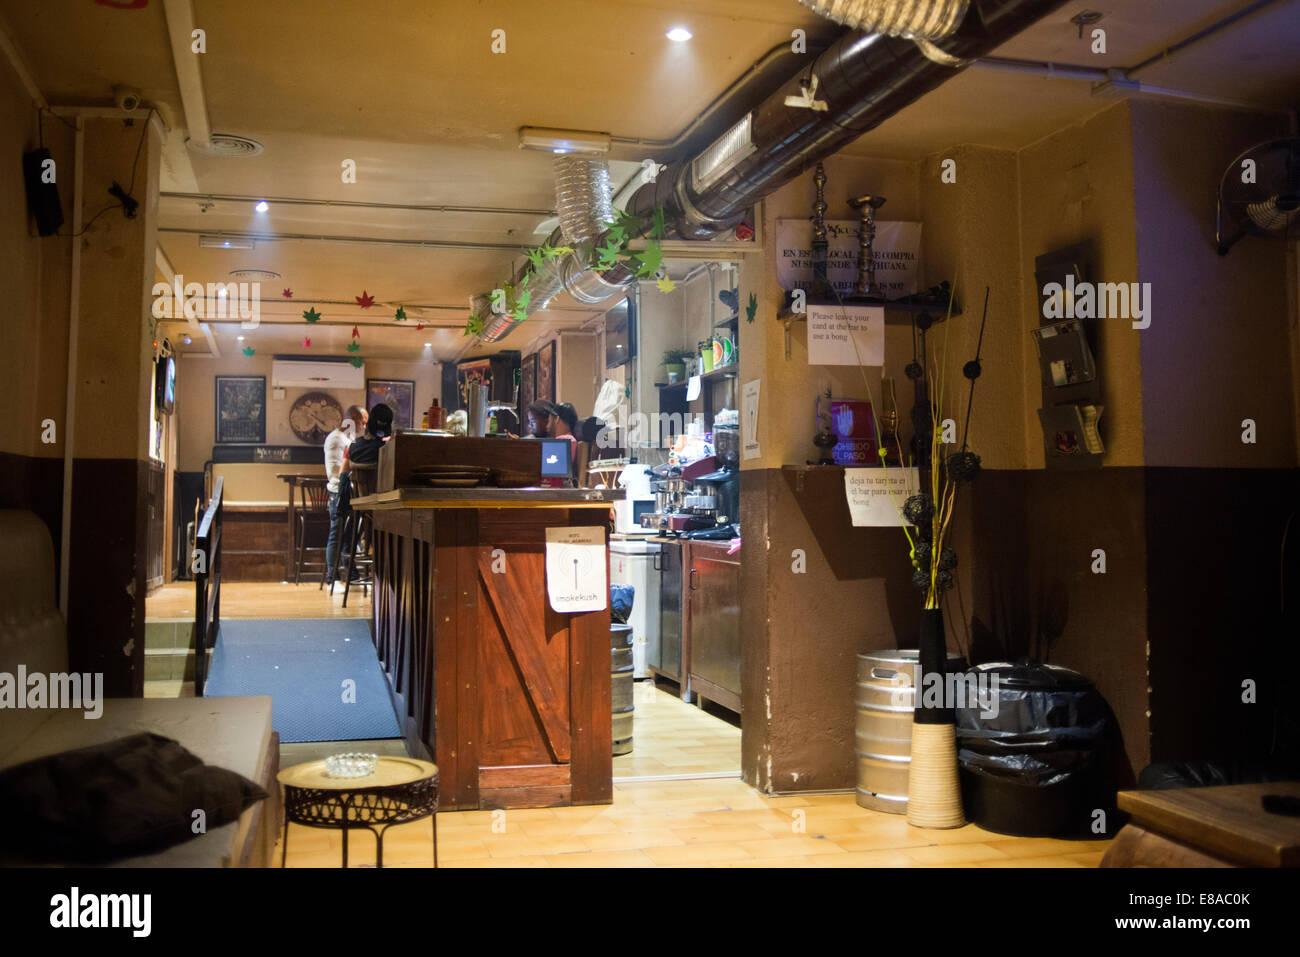 BARCELONA COFFEE SHOPS CANNABIS Marijuana In Barcelona.  Inside the Kush Cannabis association, specializing in tourists. - Stock Image